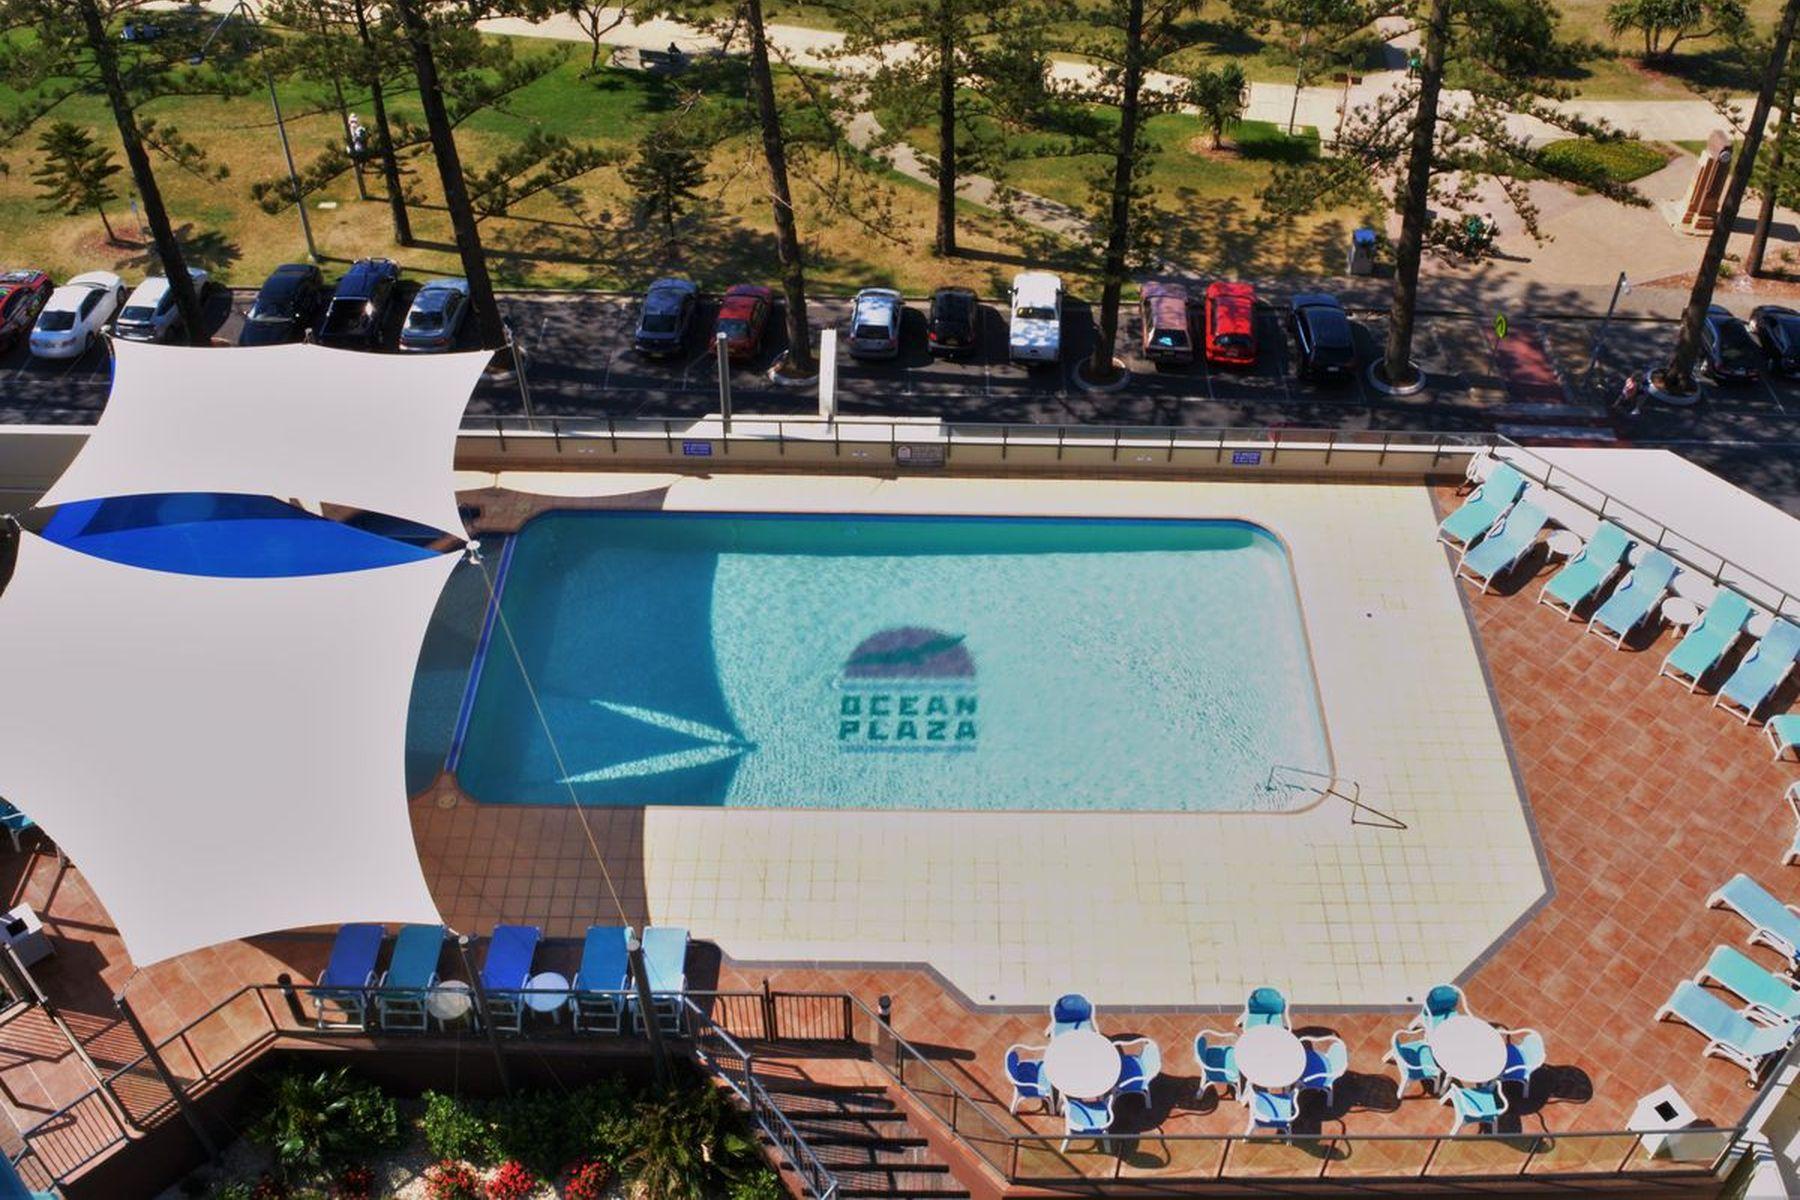 Ocean Plaza Pool